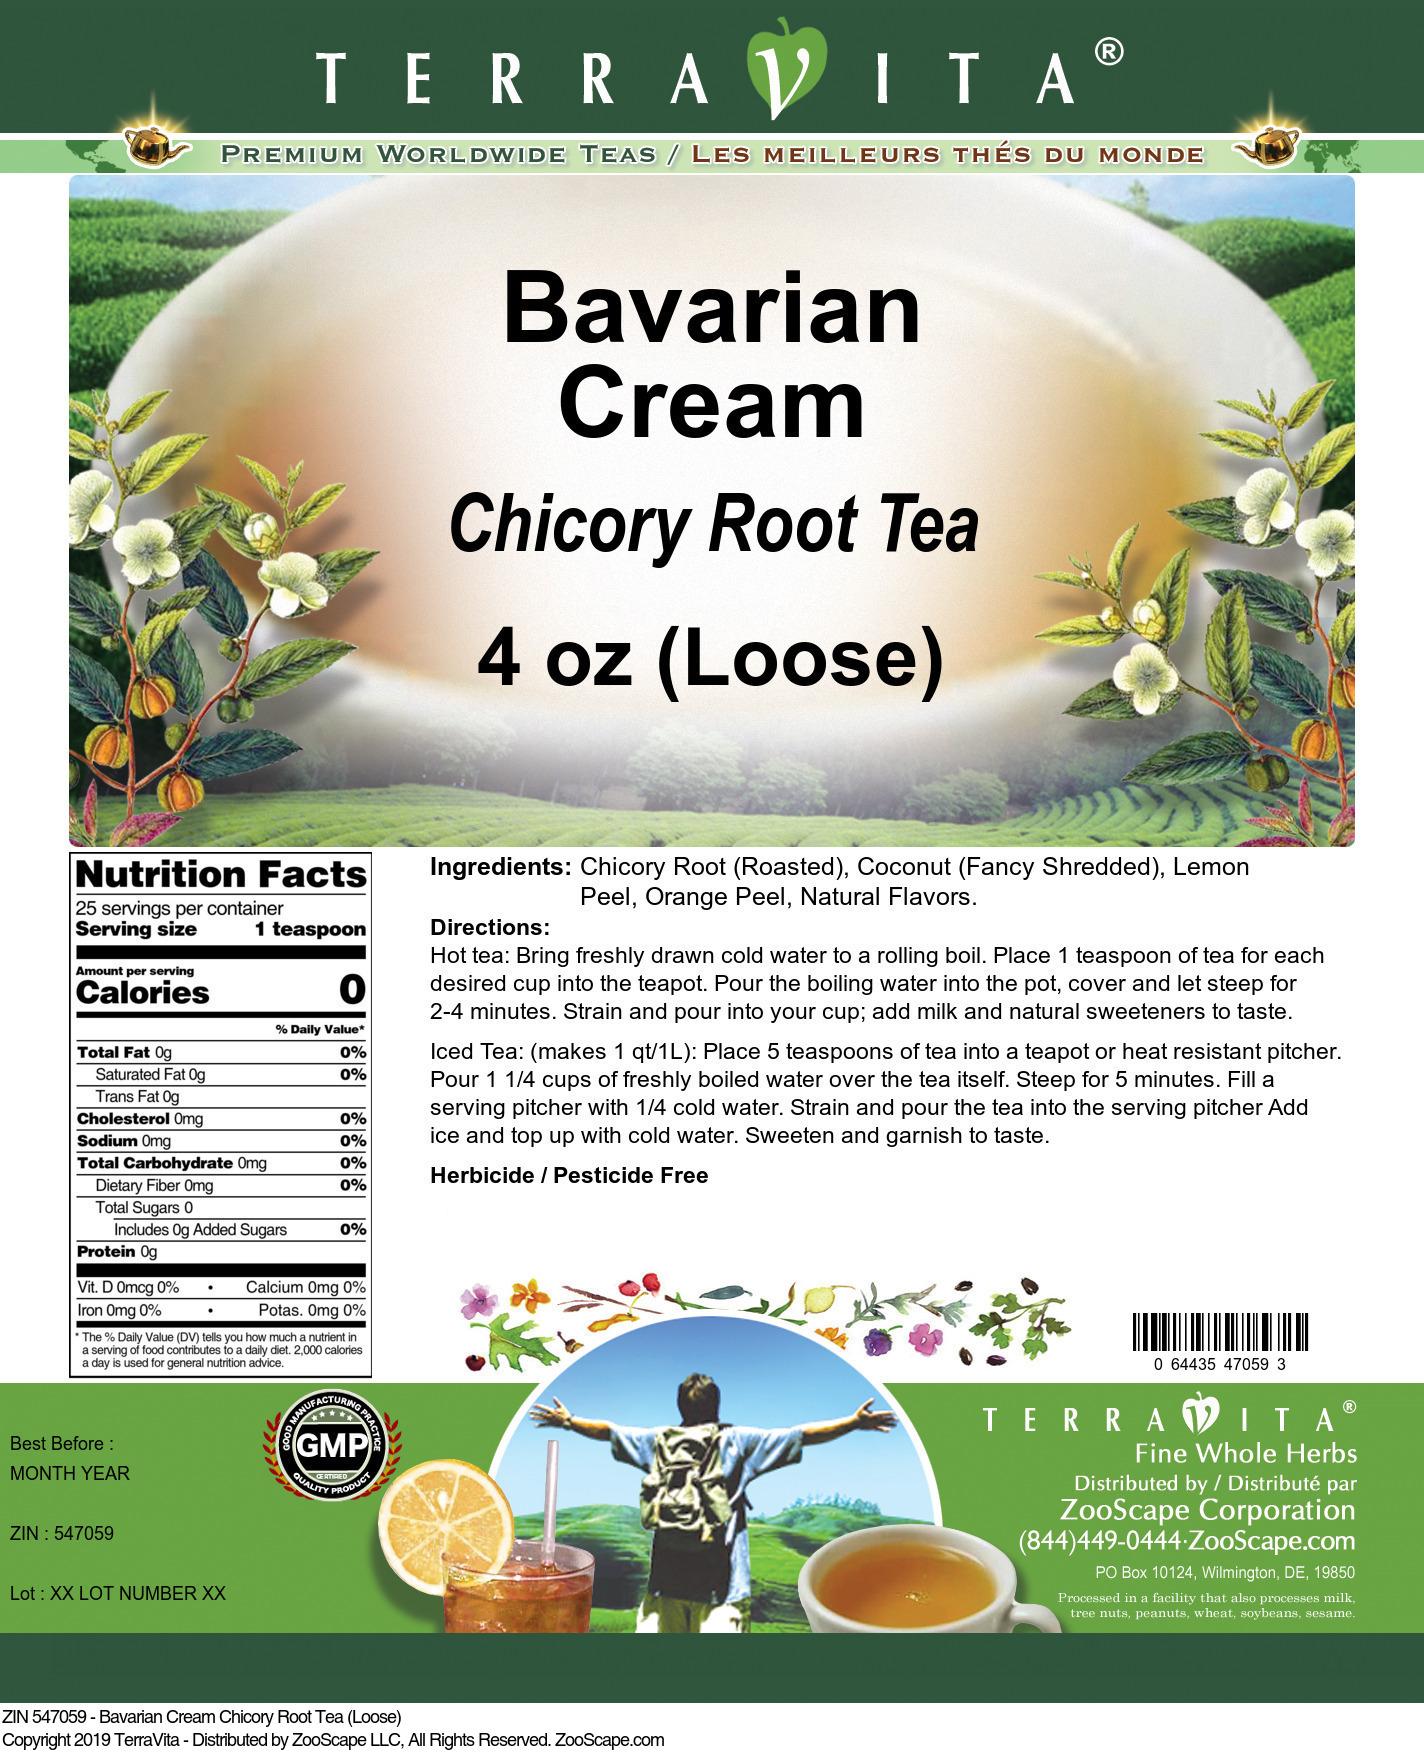 Bavarian Cream Chicory Root Tea (Loose)